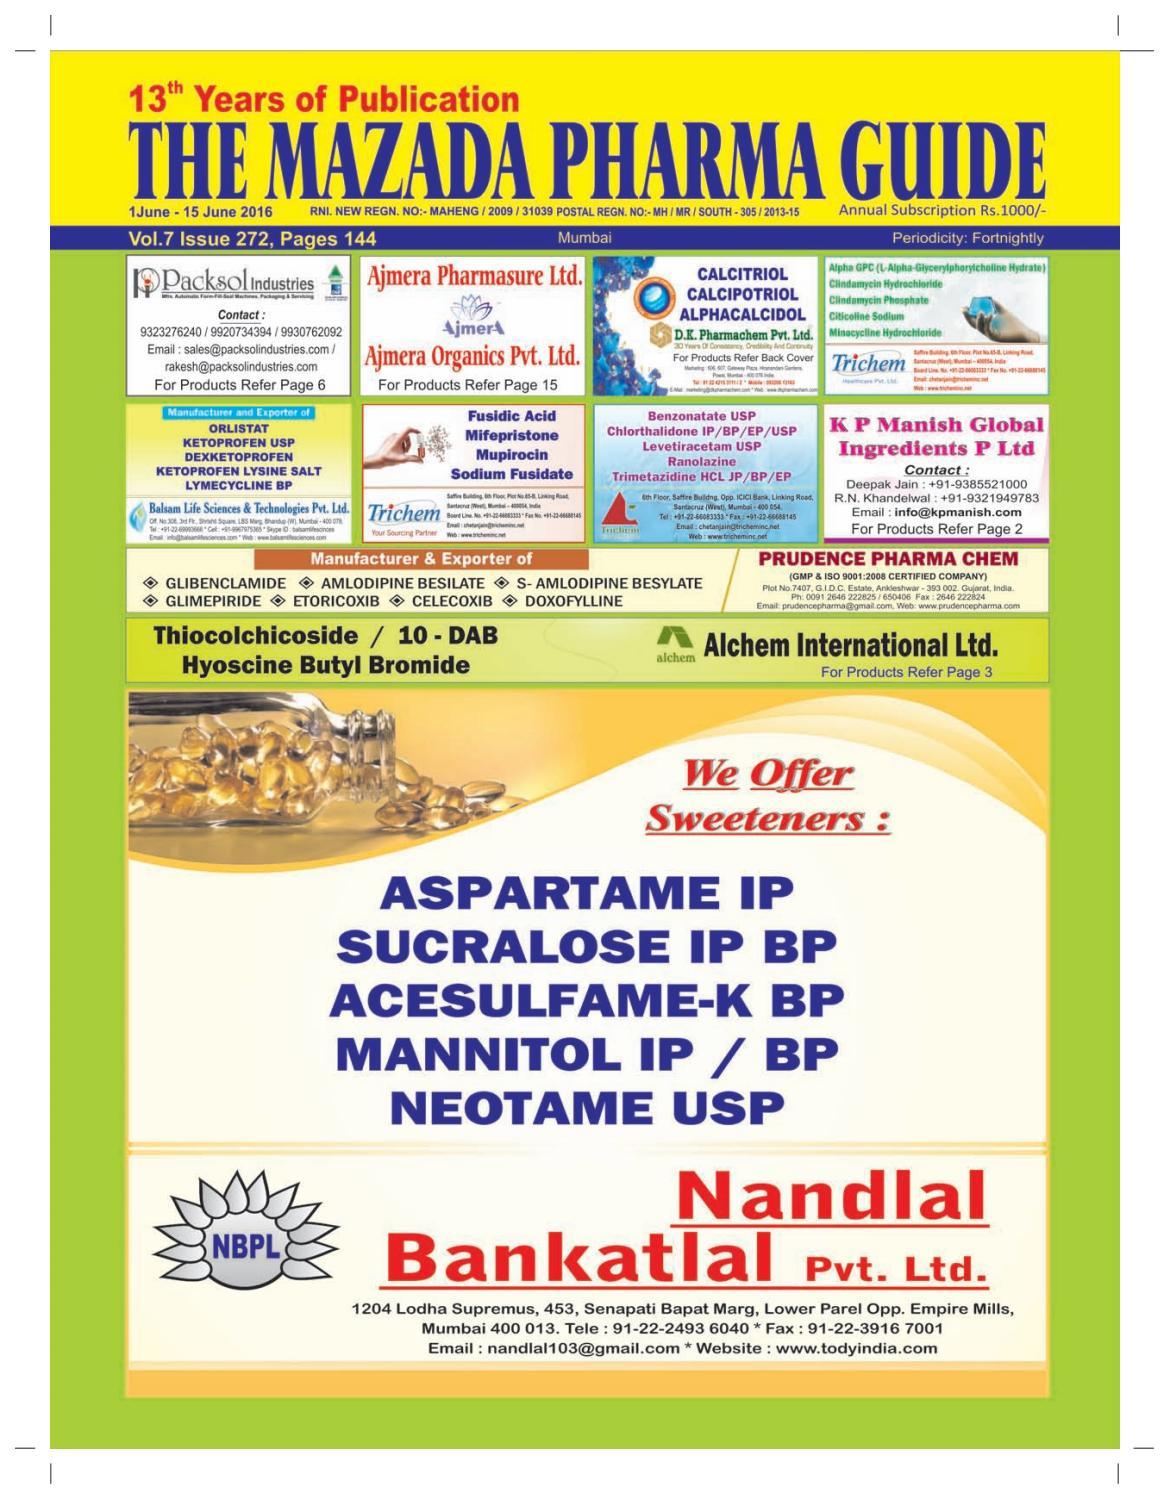 The Mazada Pharma Guide 1st To 15th June 2016 By Tween 20 Polysorbate 1kg Issuu